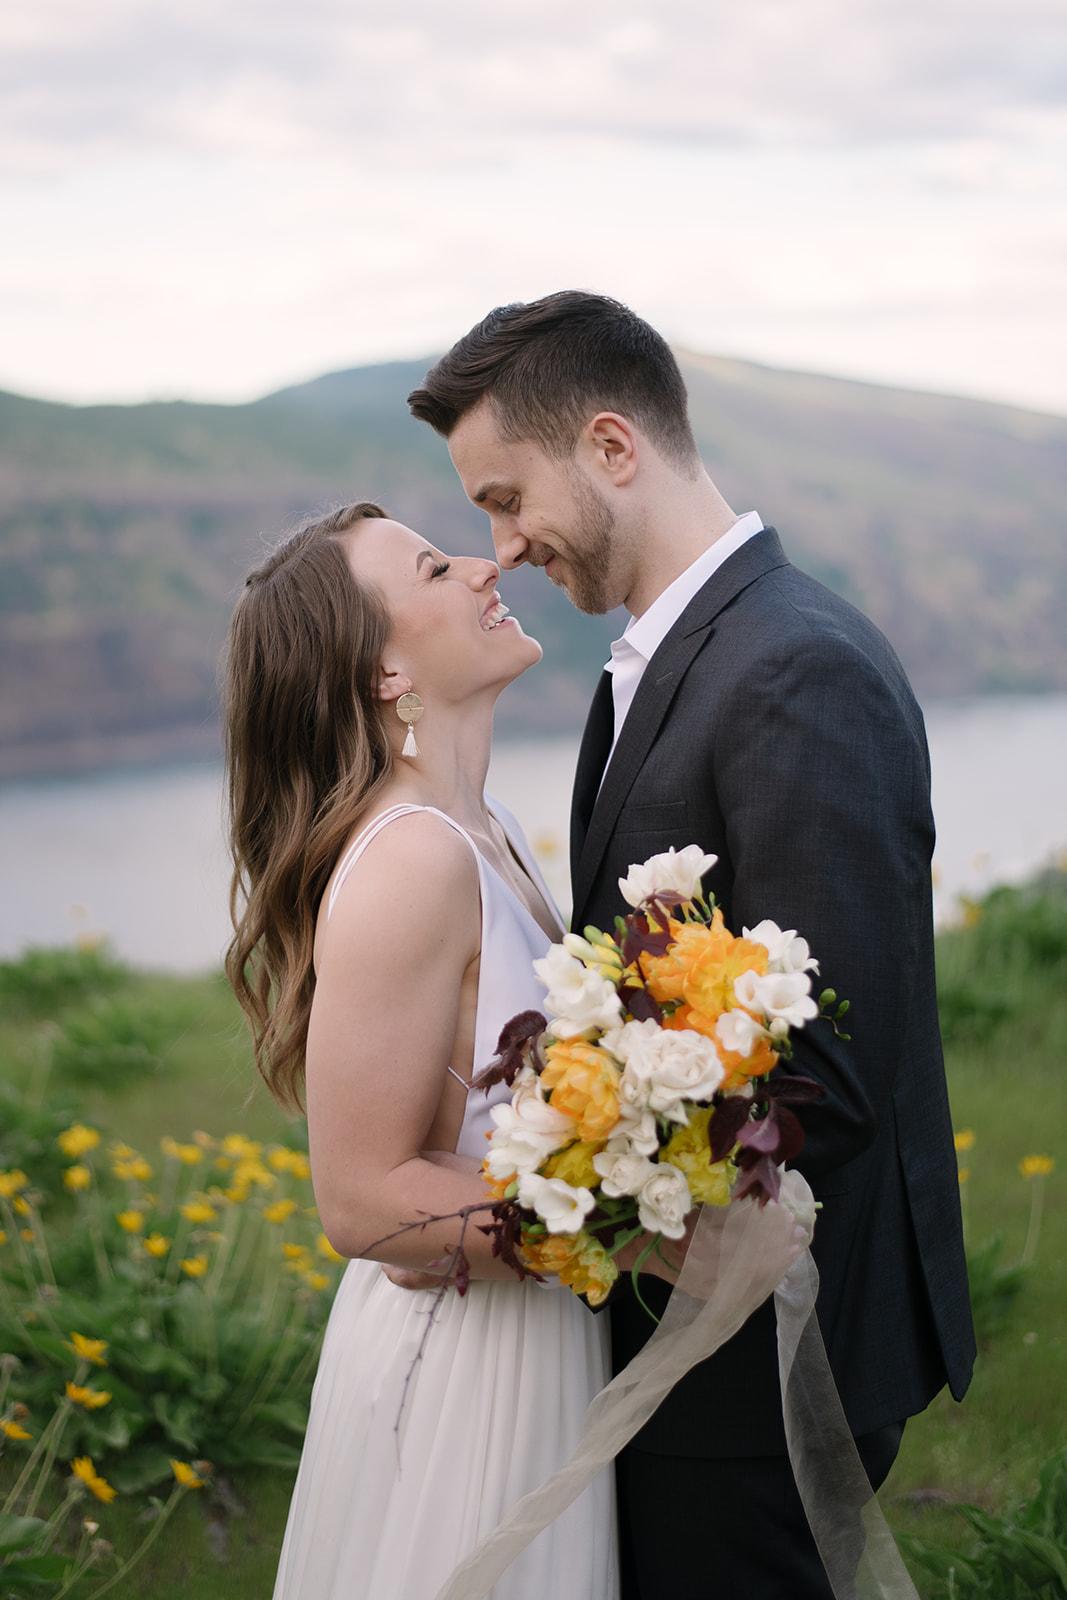 kamea_events_wedding_planner_portland_DeusAmor22.jpg